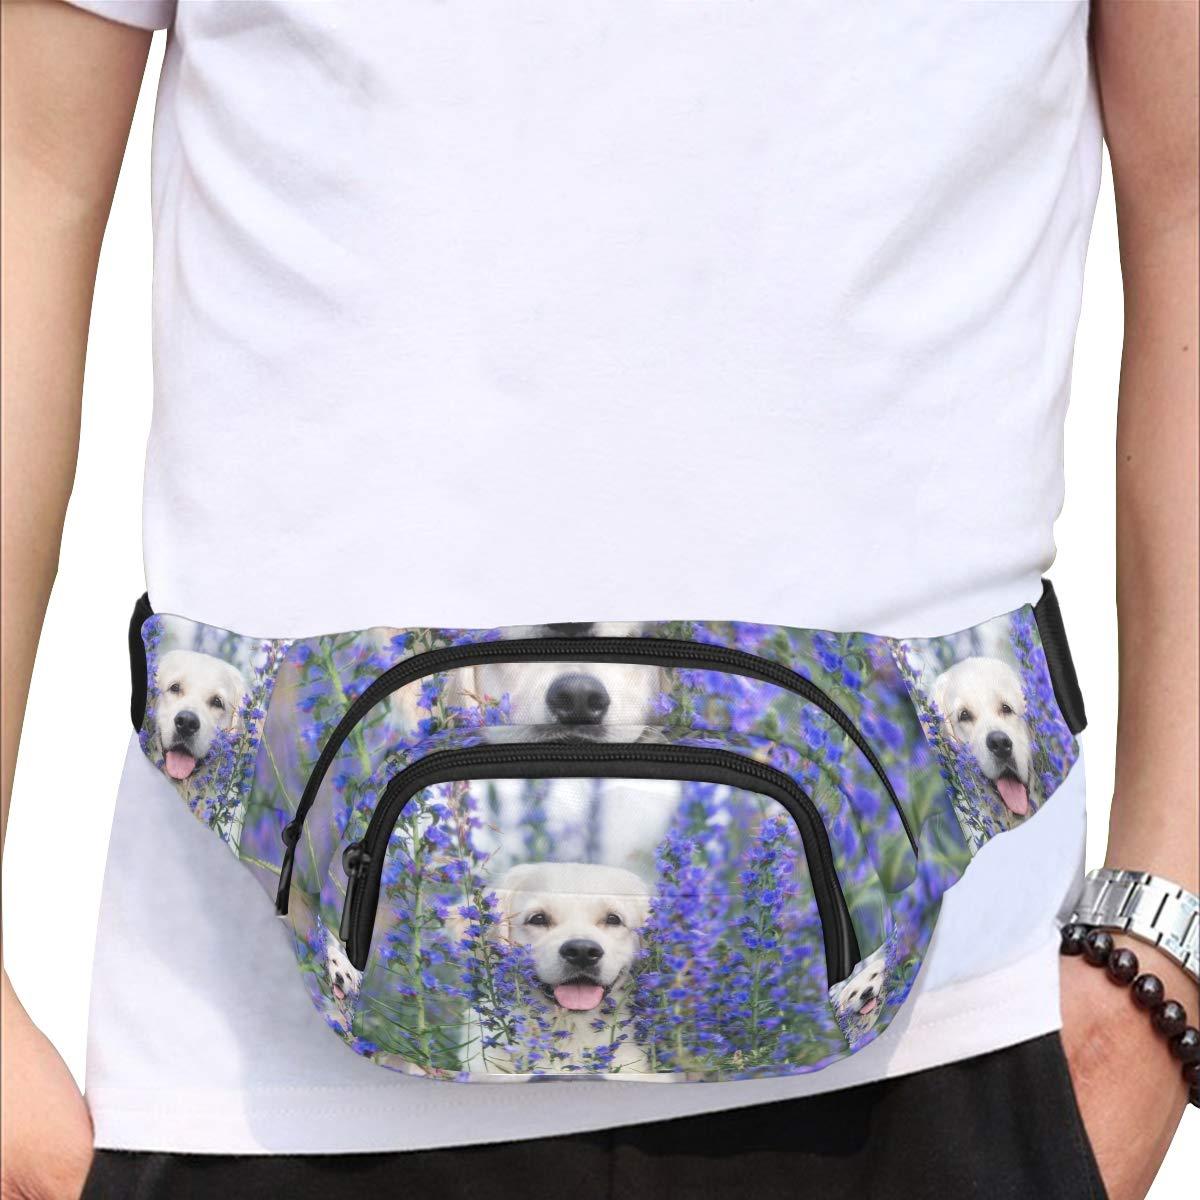 Dog In The Beautiful Flower Fields Fenny Packs Waist Bags Adjustable Belt Waterproof Nylon Travel Running Sport Vacation Party For Men Women Boys Girls Kids